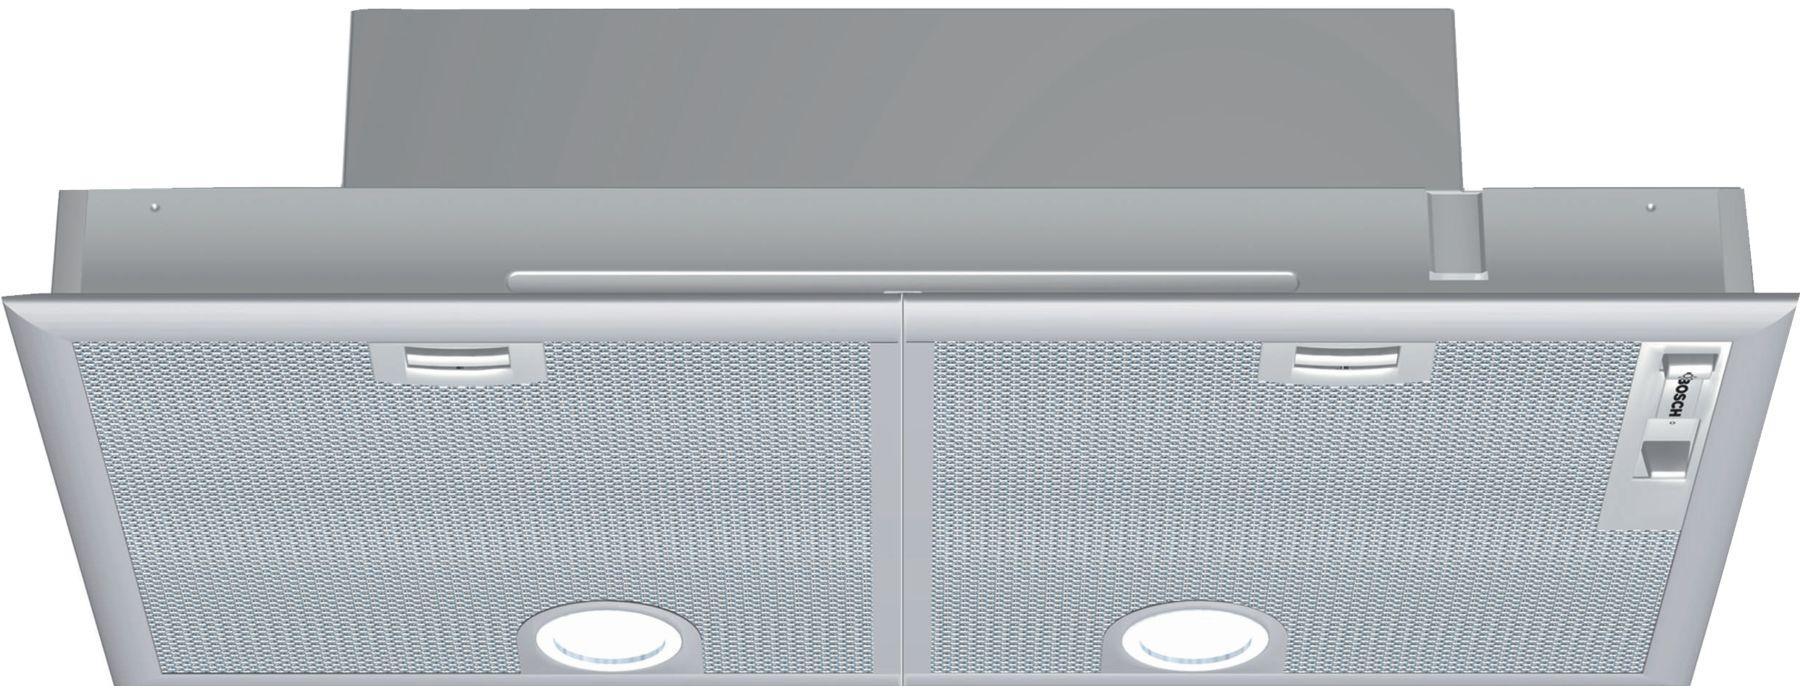 "Bosch 500 Series30"" Custom Insert Hood, 400 CFM, DHL755BUC, Stainless Steel"